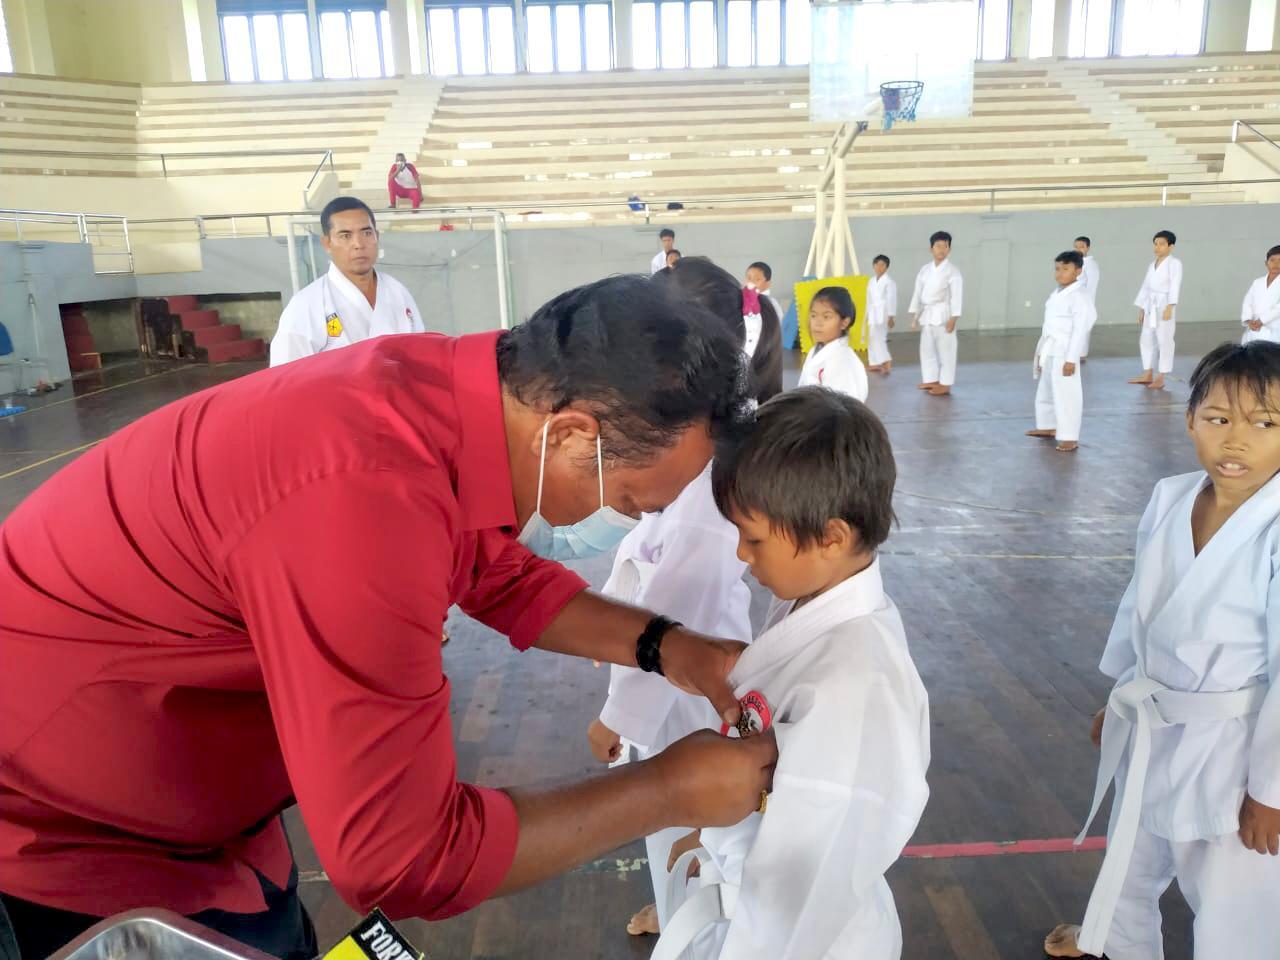 KETUA DPRD Klungkung, AA Gde Anom, menghadiri acara Gashuku Lemkari di GOR Swecapura Klungkung, Minggu (30/5/2021). Foto: ist